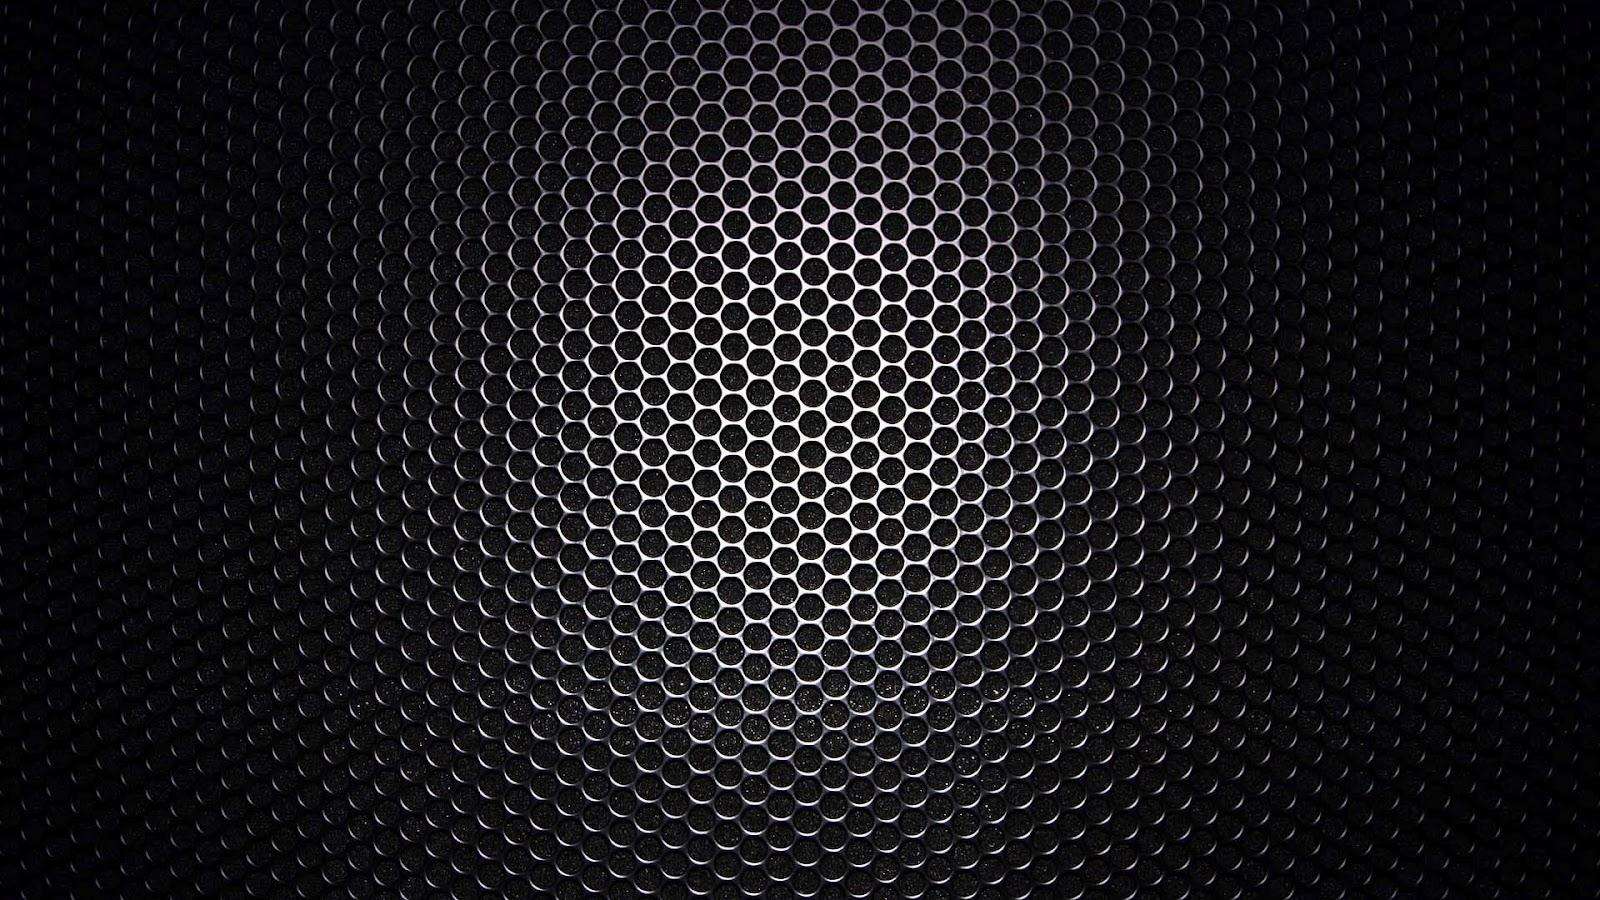 48+ Black HD Wallpaper 1920x1080 on WallpaperSafari